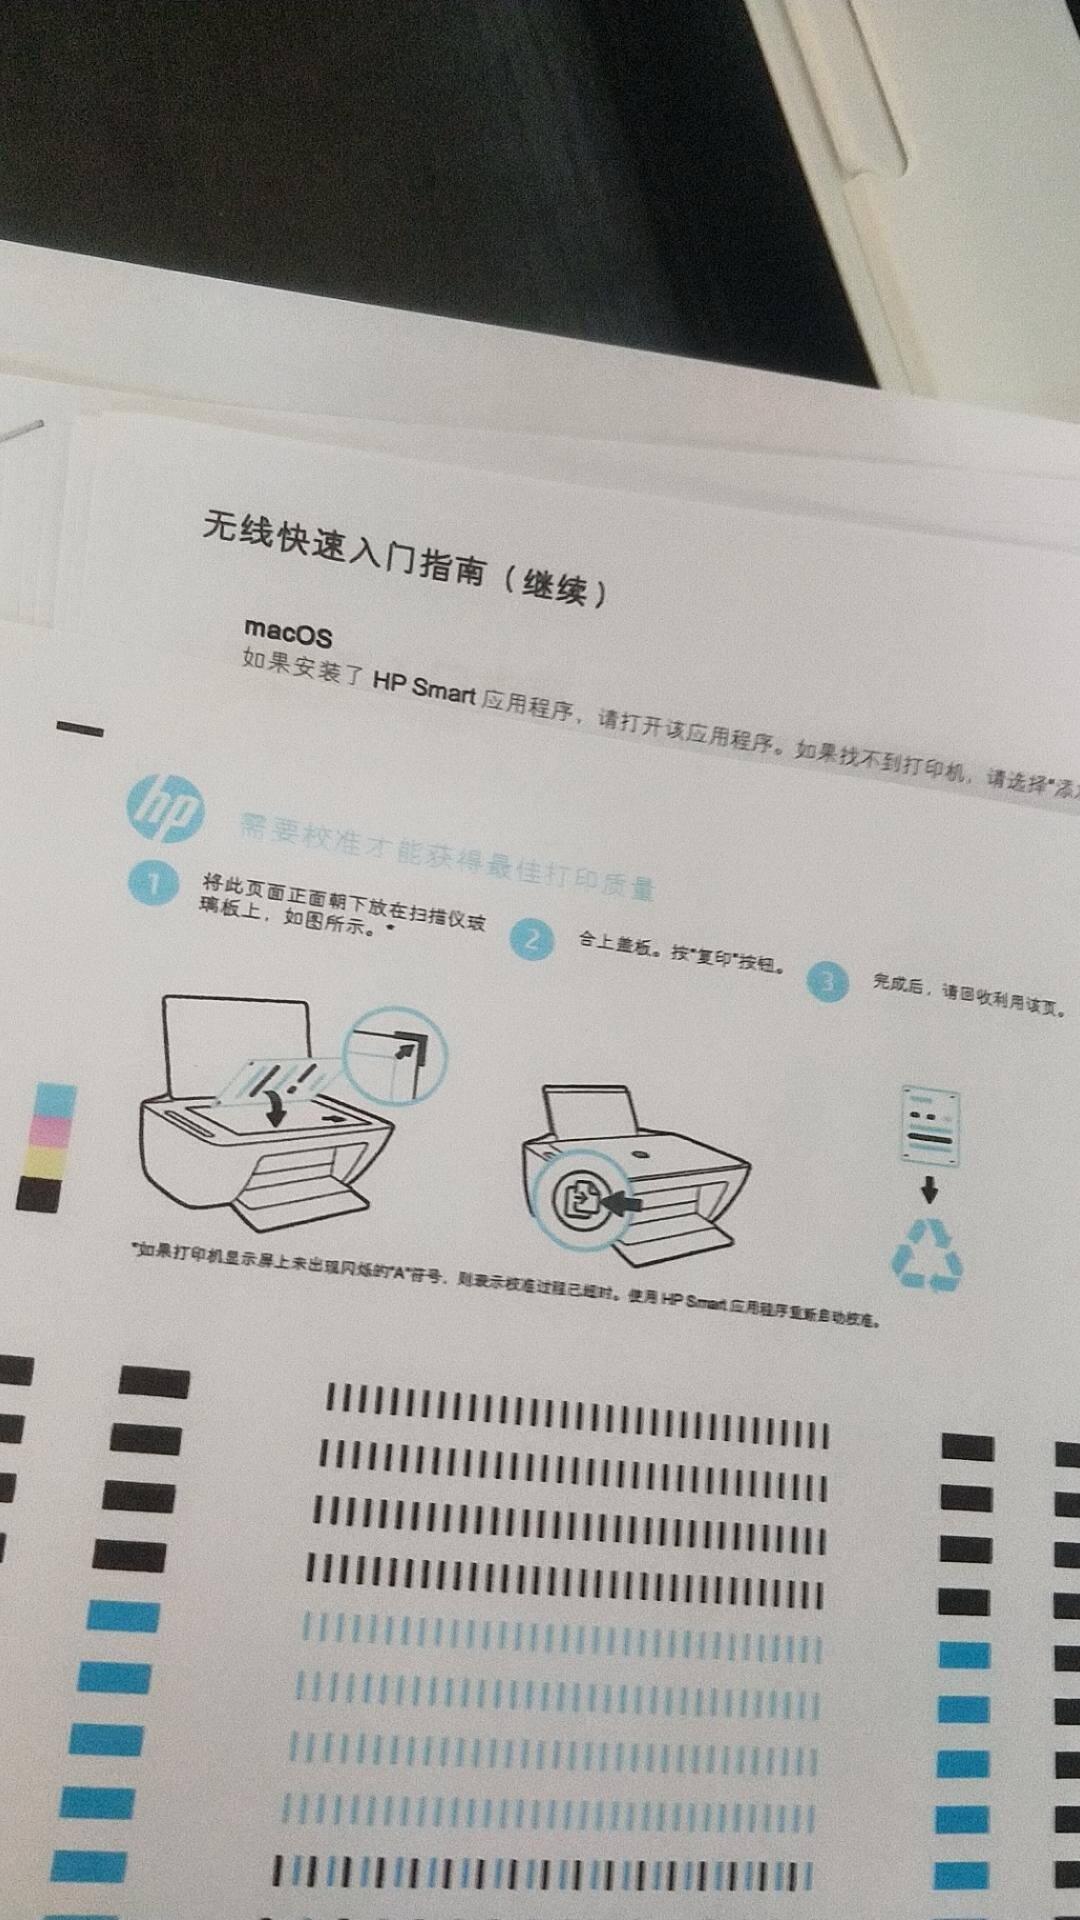 hp惠普2729家用办公学生作业手机无线彩色喷墨照片打印机复印扫描一体机2729官方标配(打印复印扫描+无线+USB)